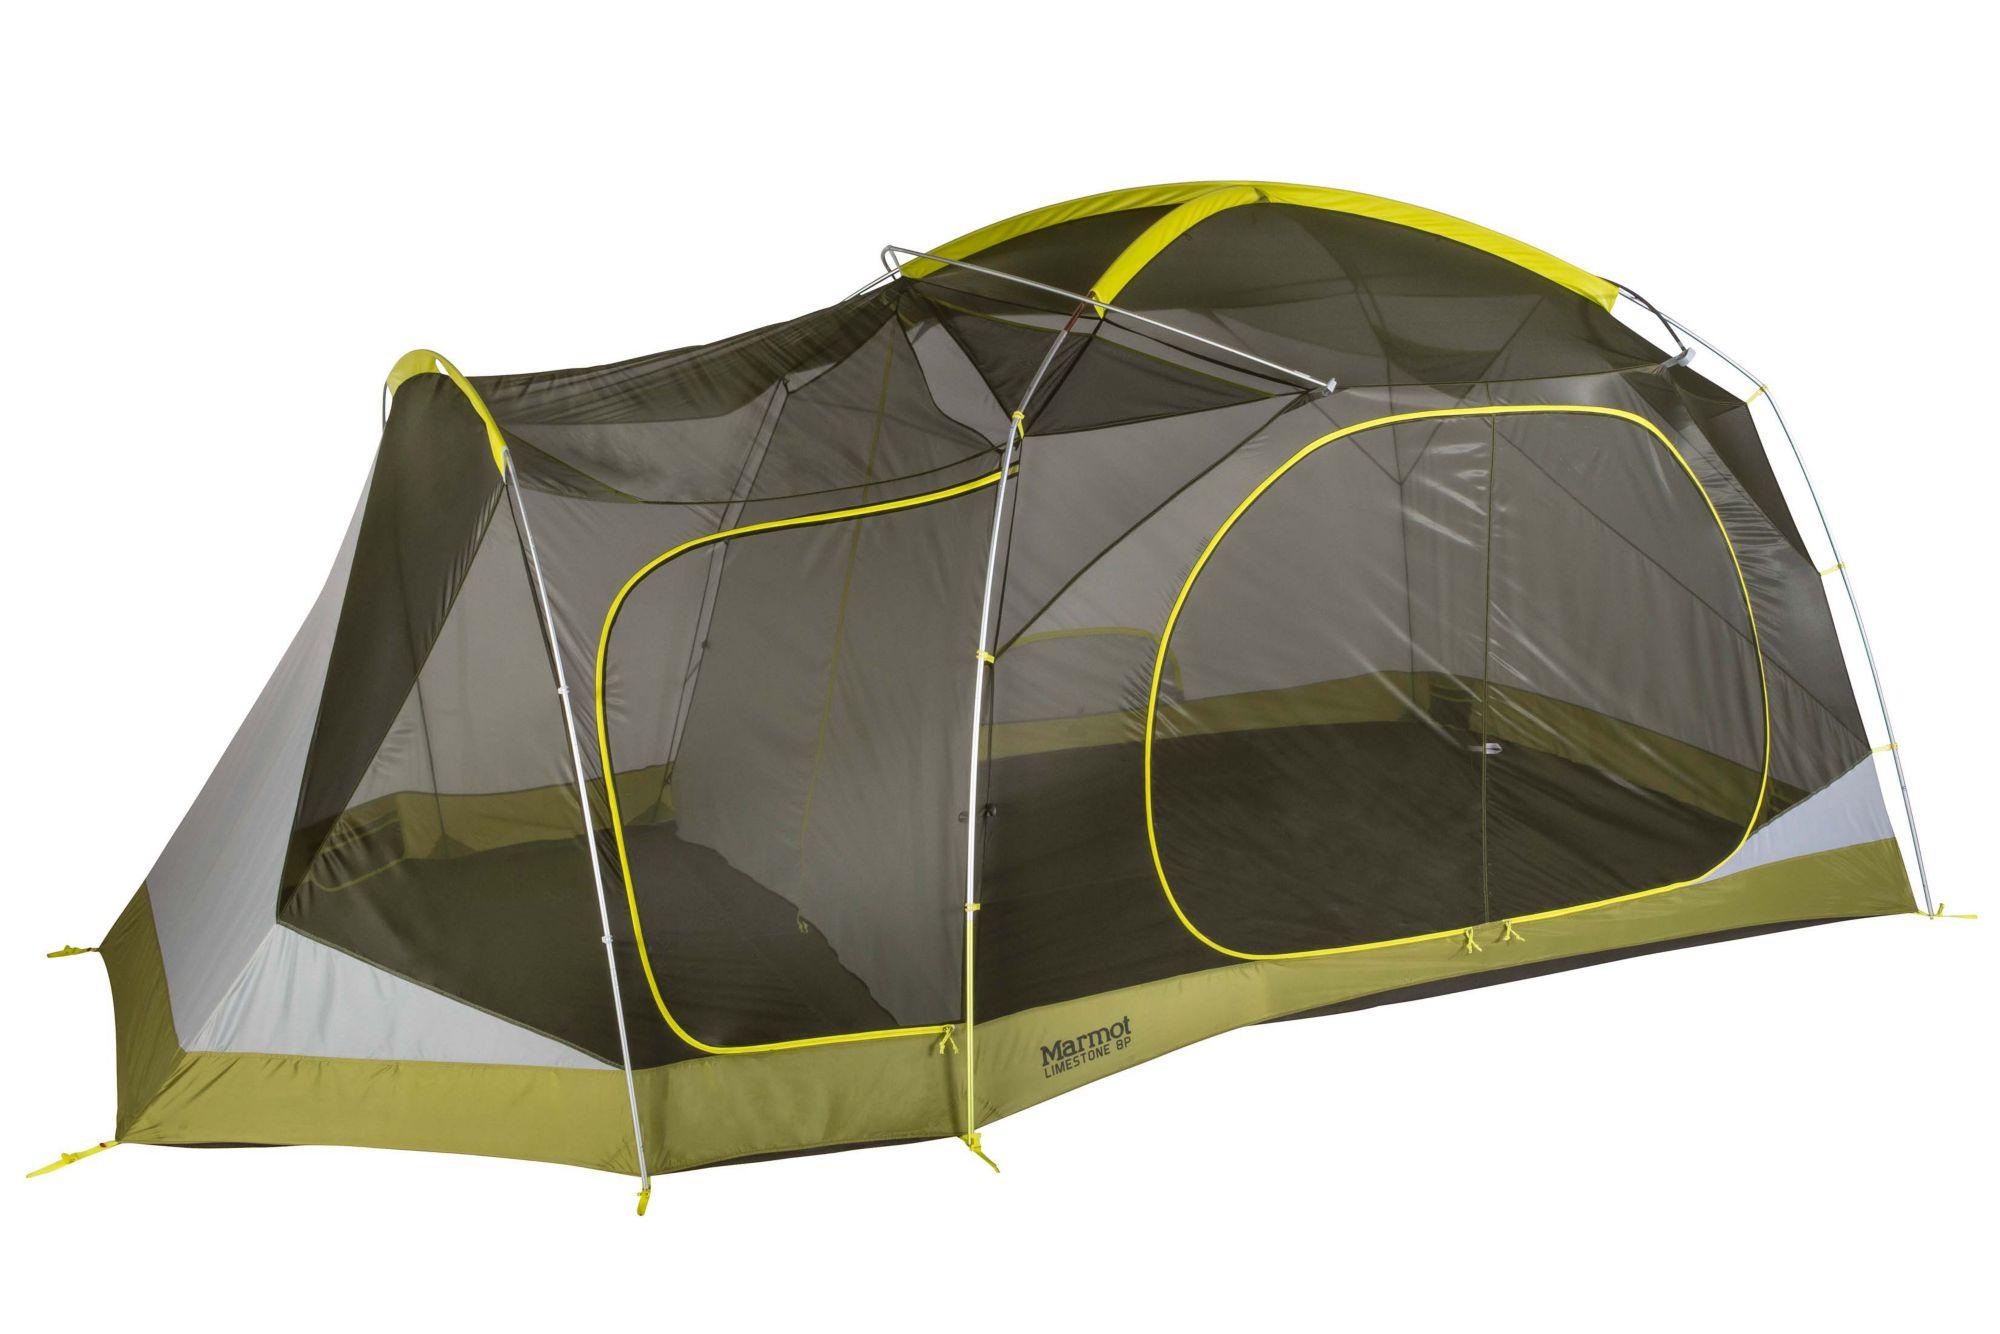 Limestone 8P Green Shadow/Moss medium  sc 1 st  Marmot & 8 Person Tents / Tents / Equipment | Marmot.com